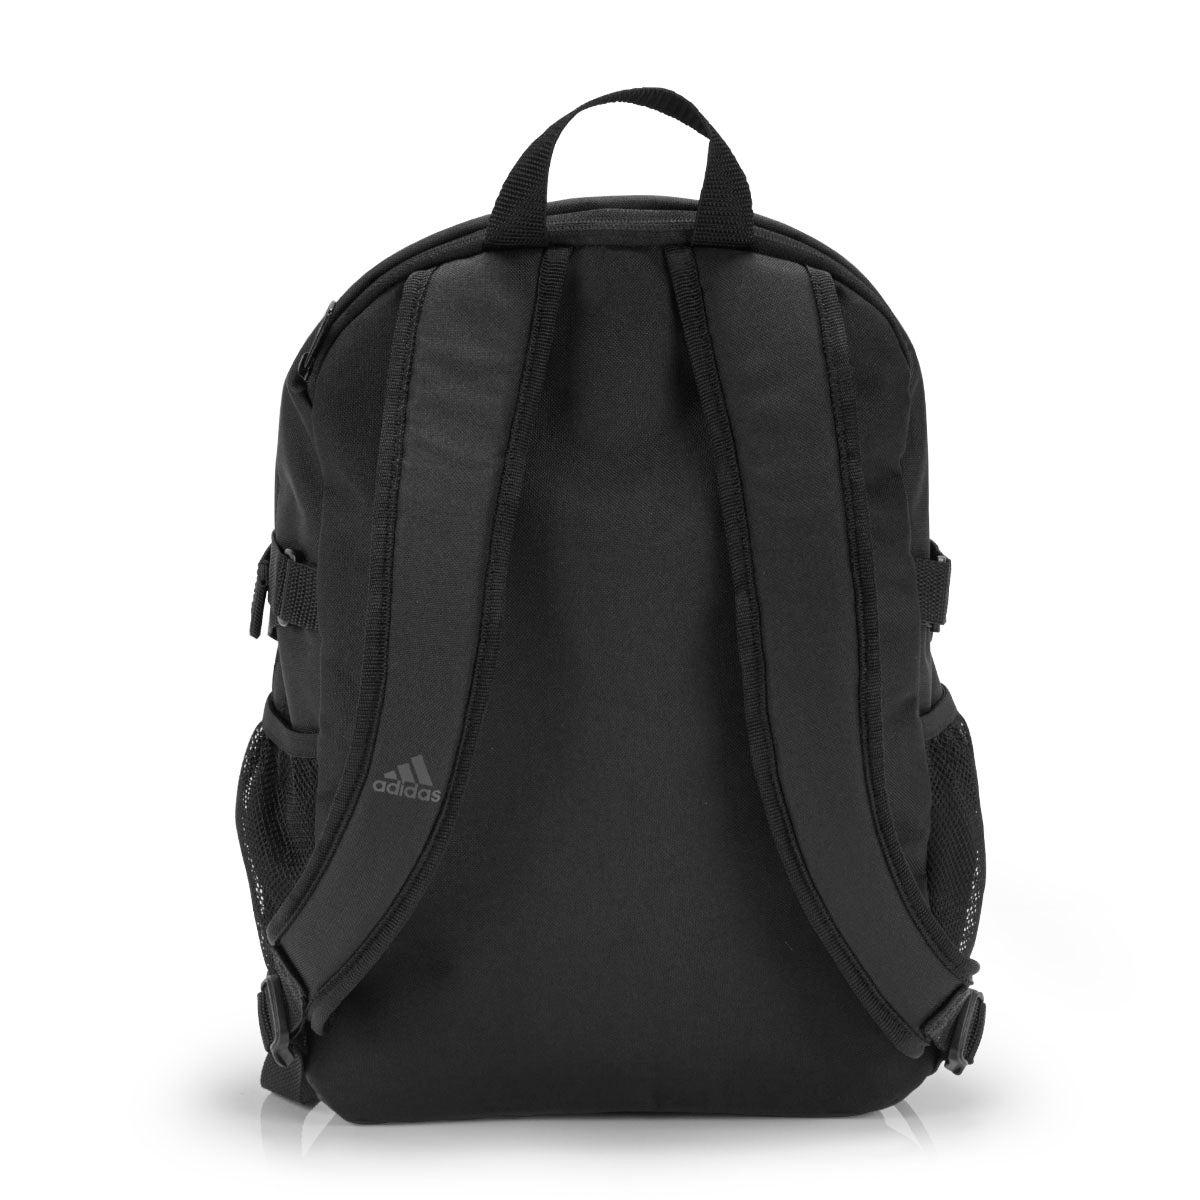 Adidas BP Power IV S MF black backpack